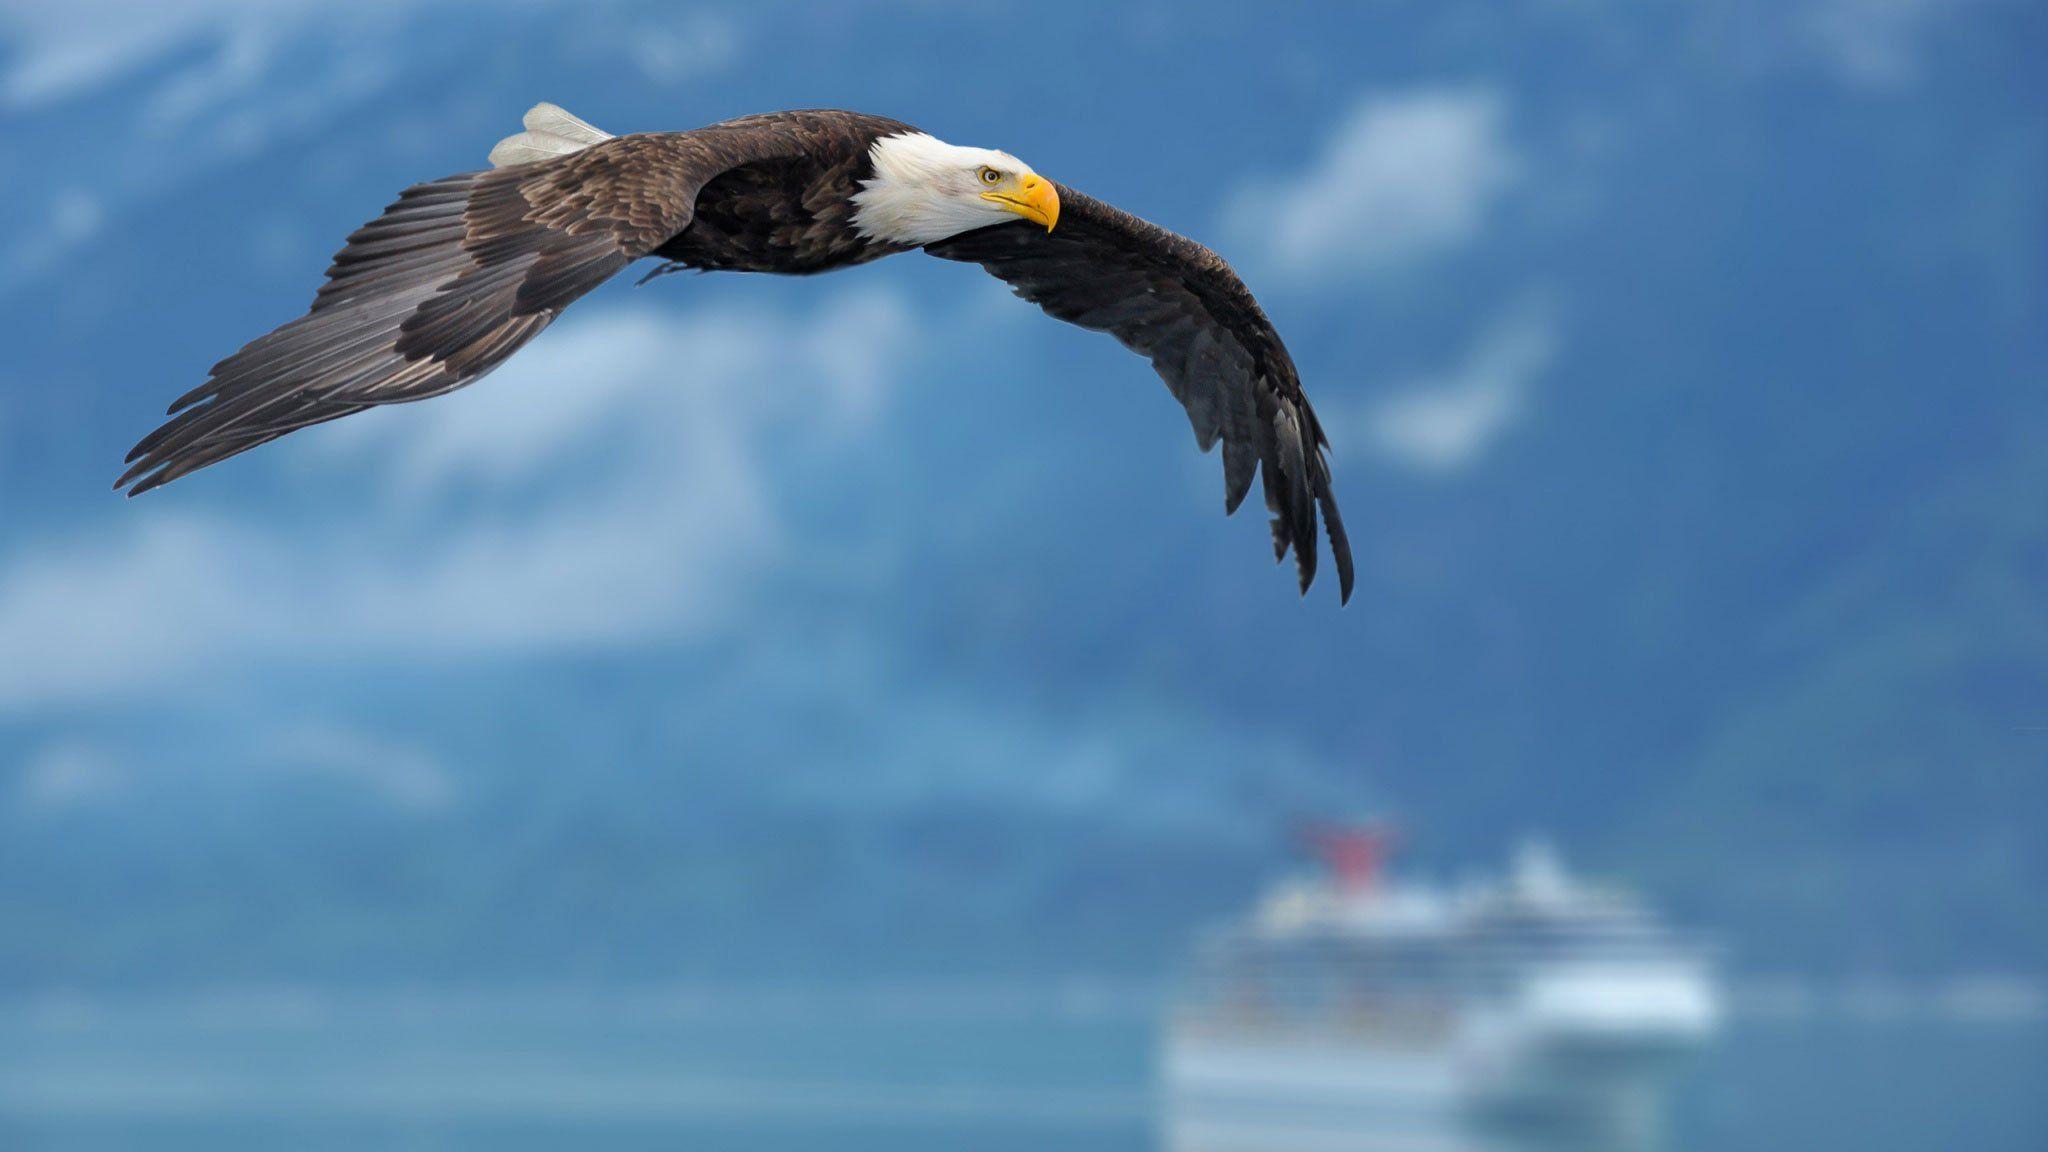 pin 1440x900 american eagle - photo #2